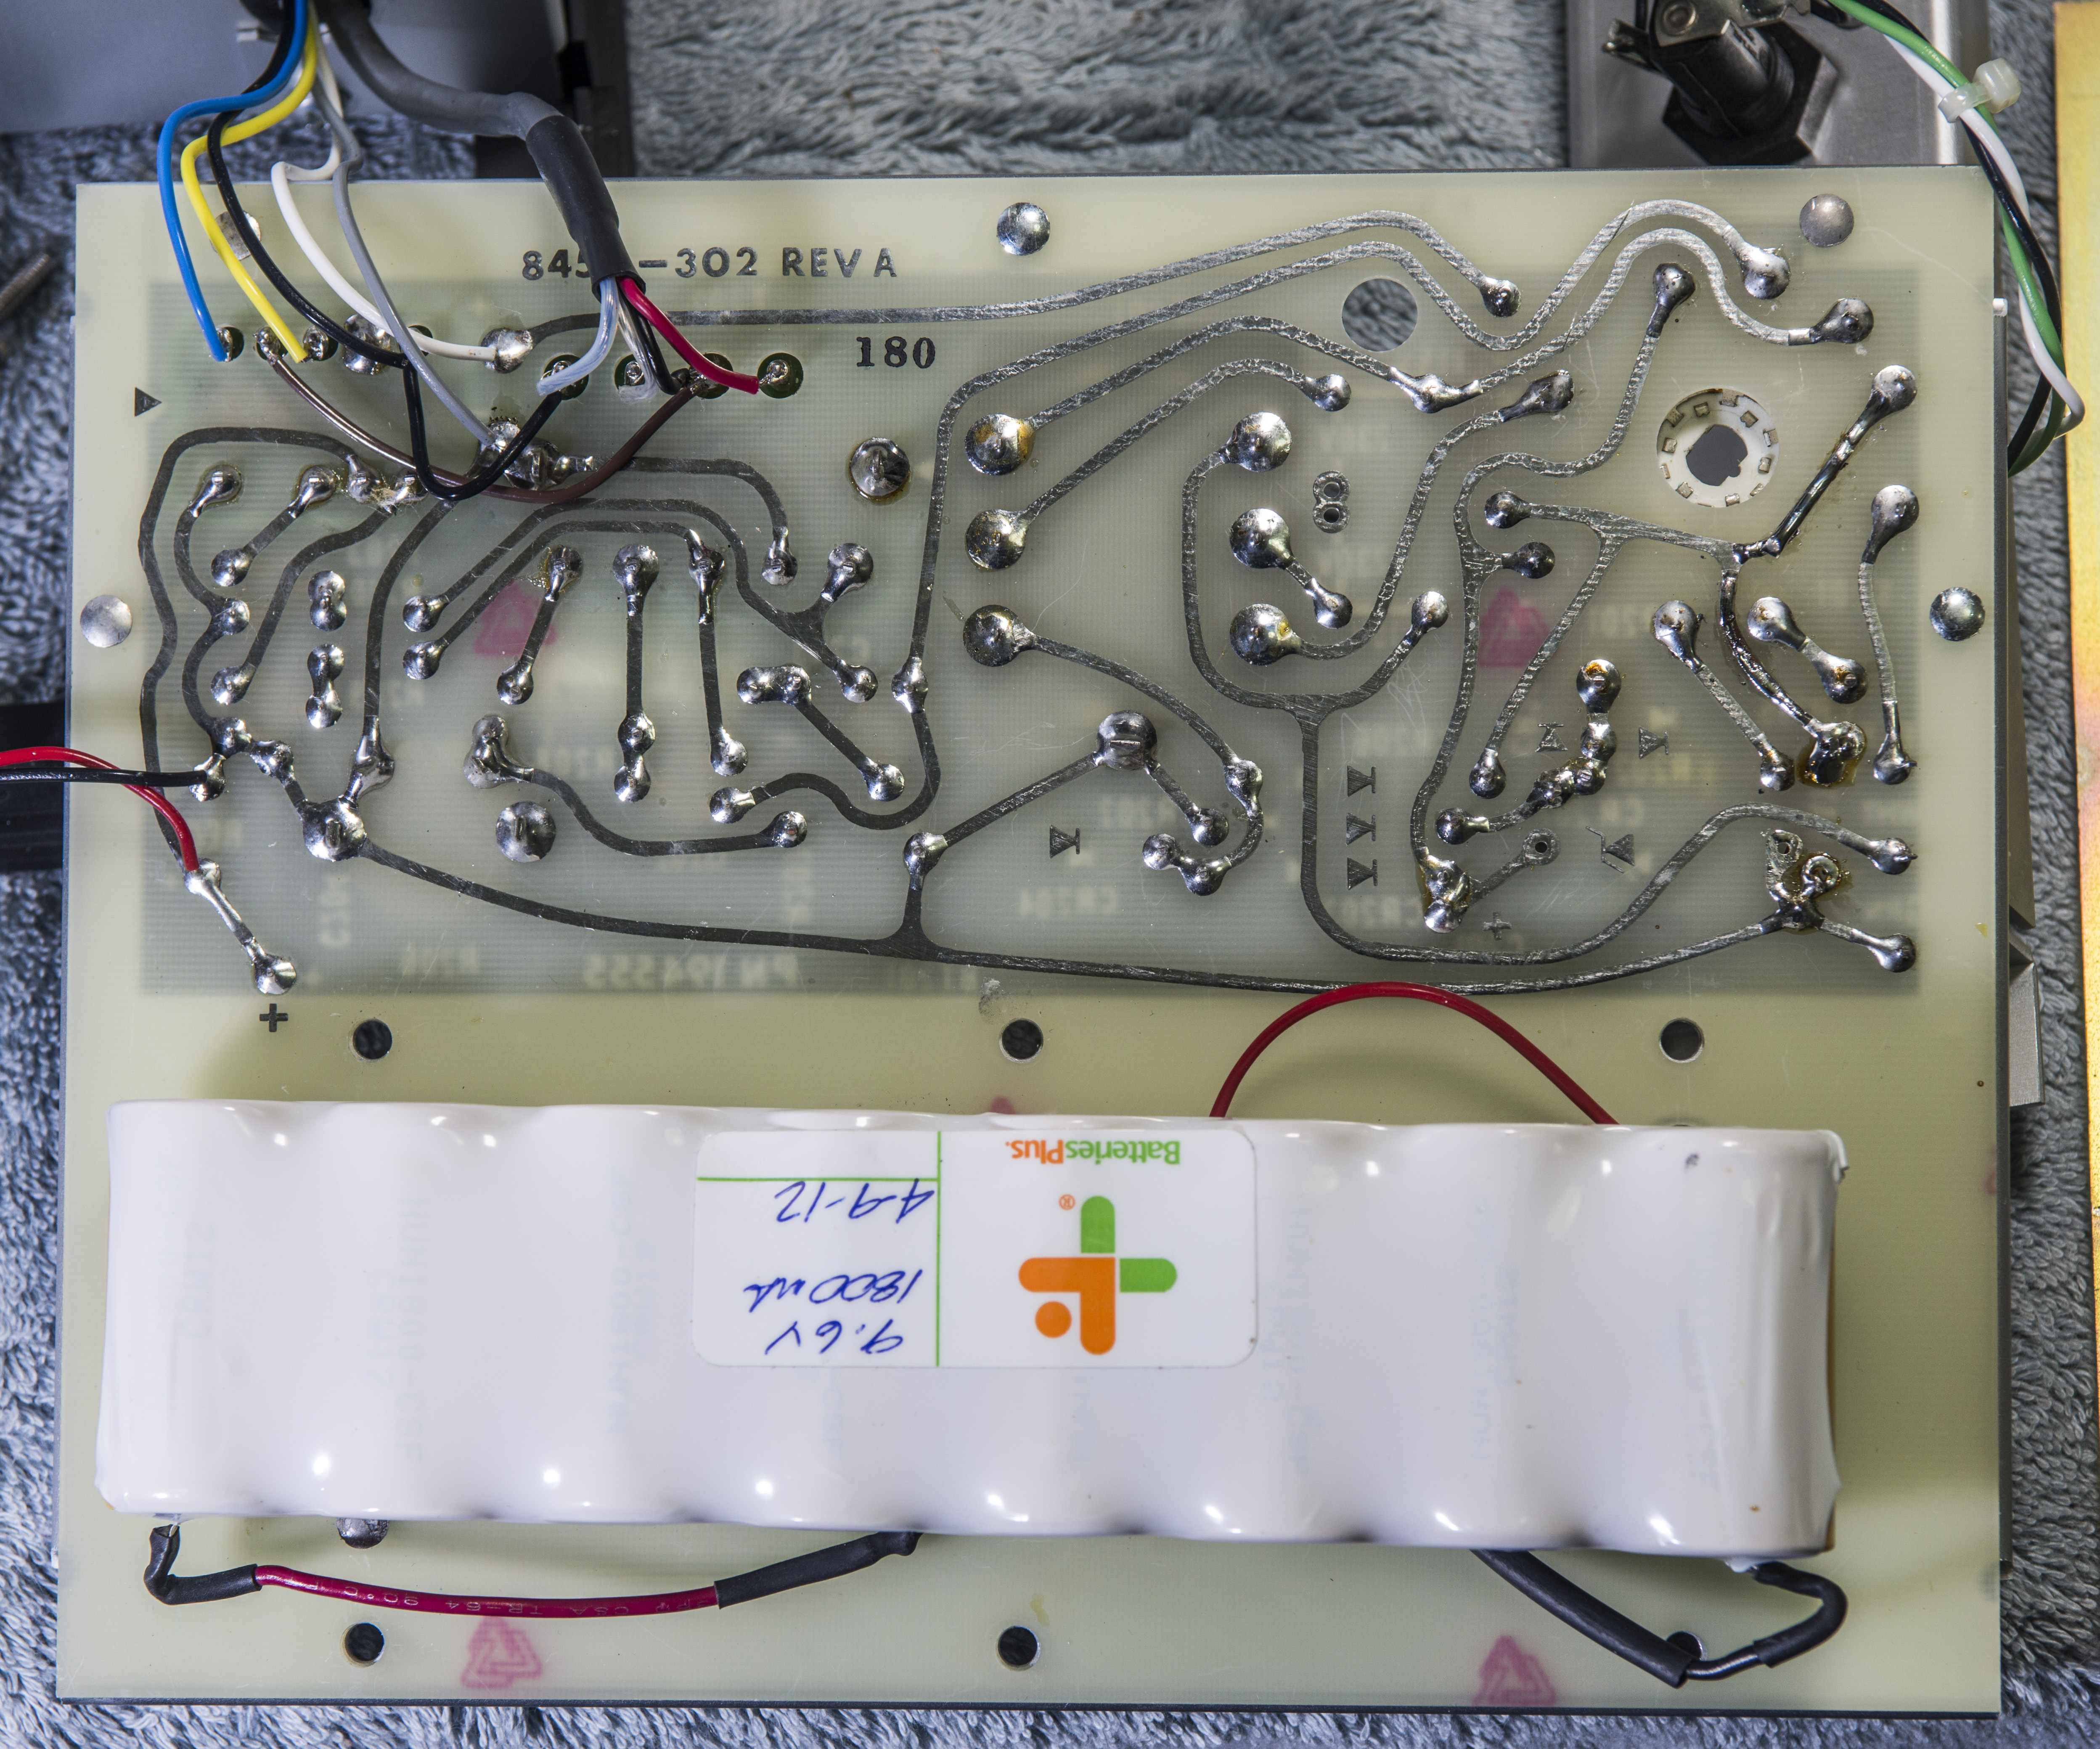 xDevs com | Repair and tweaks for Fluke 845AB null-meter